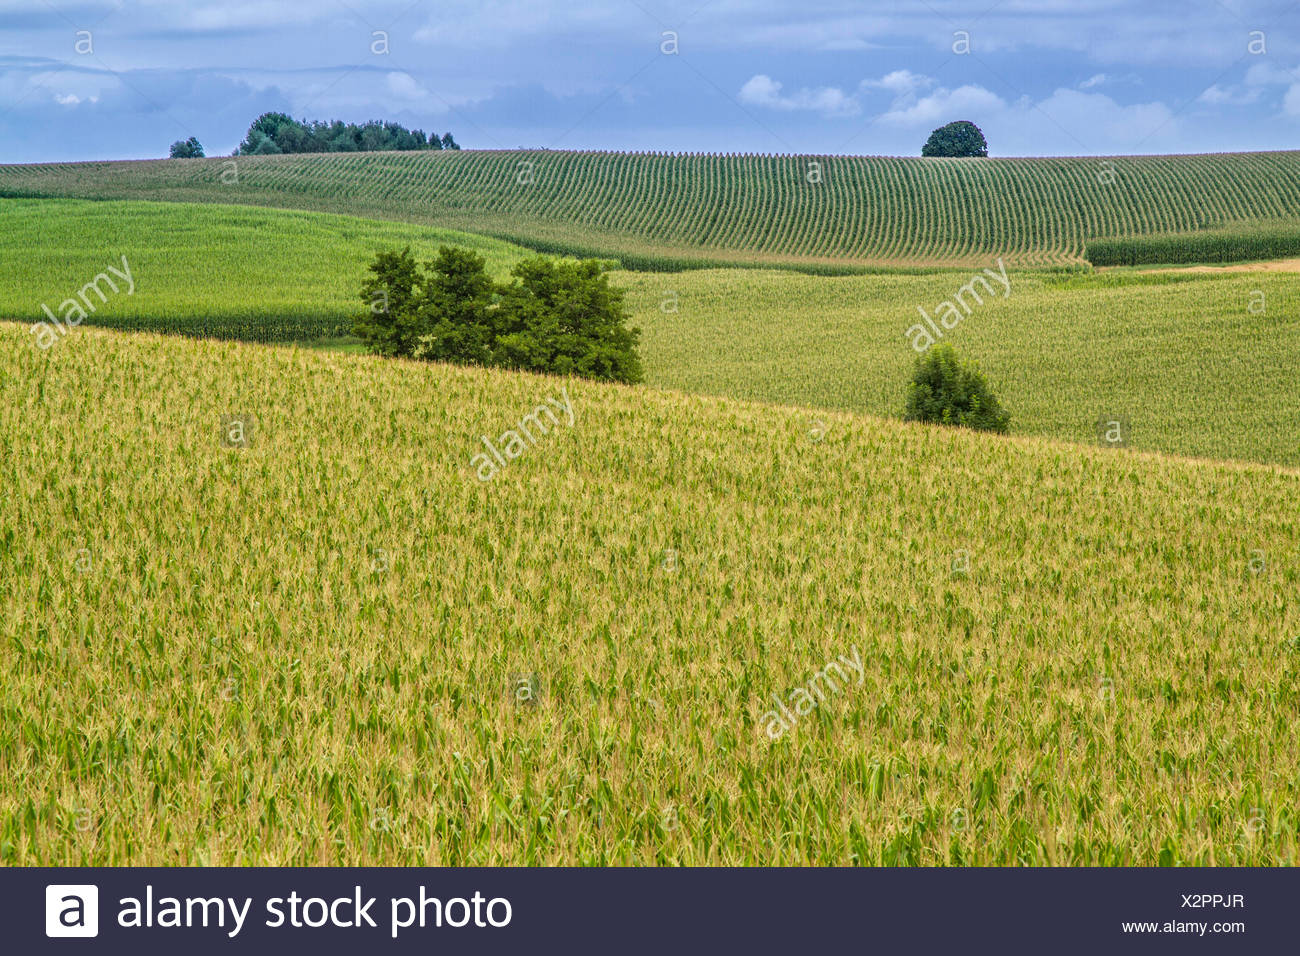 Indian corn, maize (Zea mays), biomass fields, Germany, Bavaria, Isental, Dorfen - Stock Image